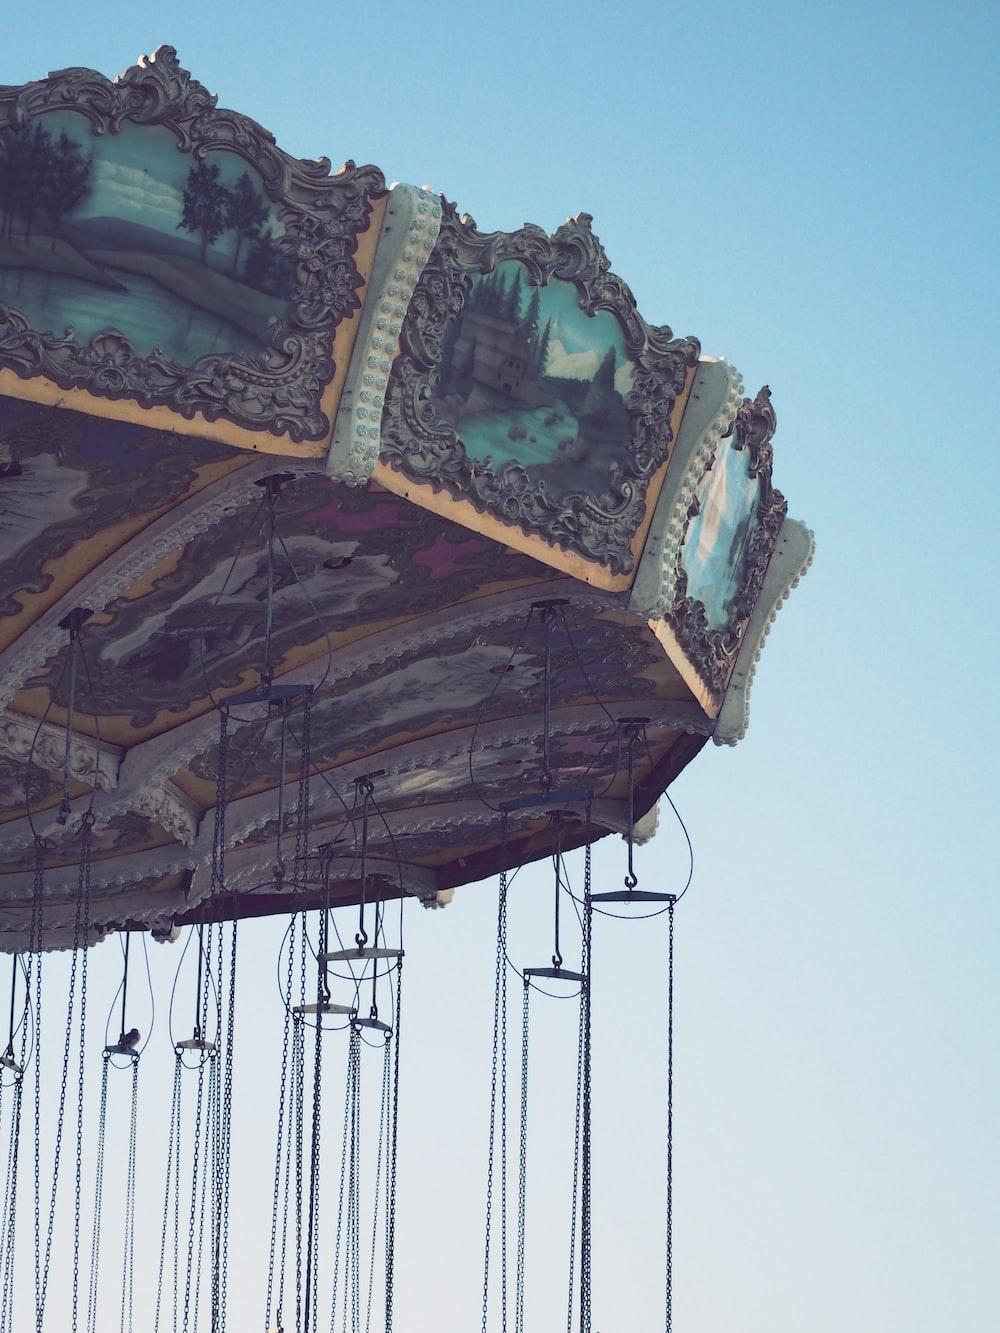 shallow focus photography of teal amusement park ride